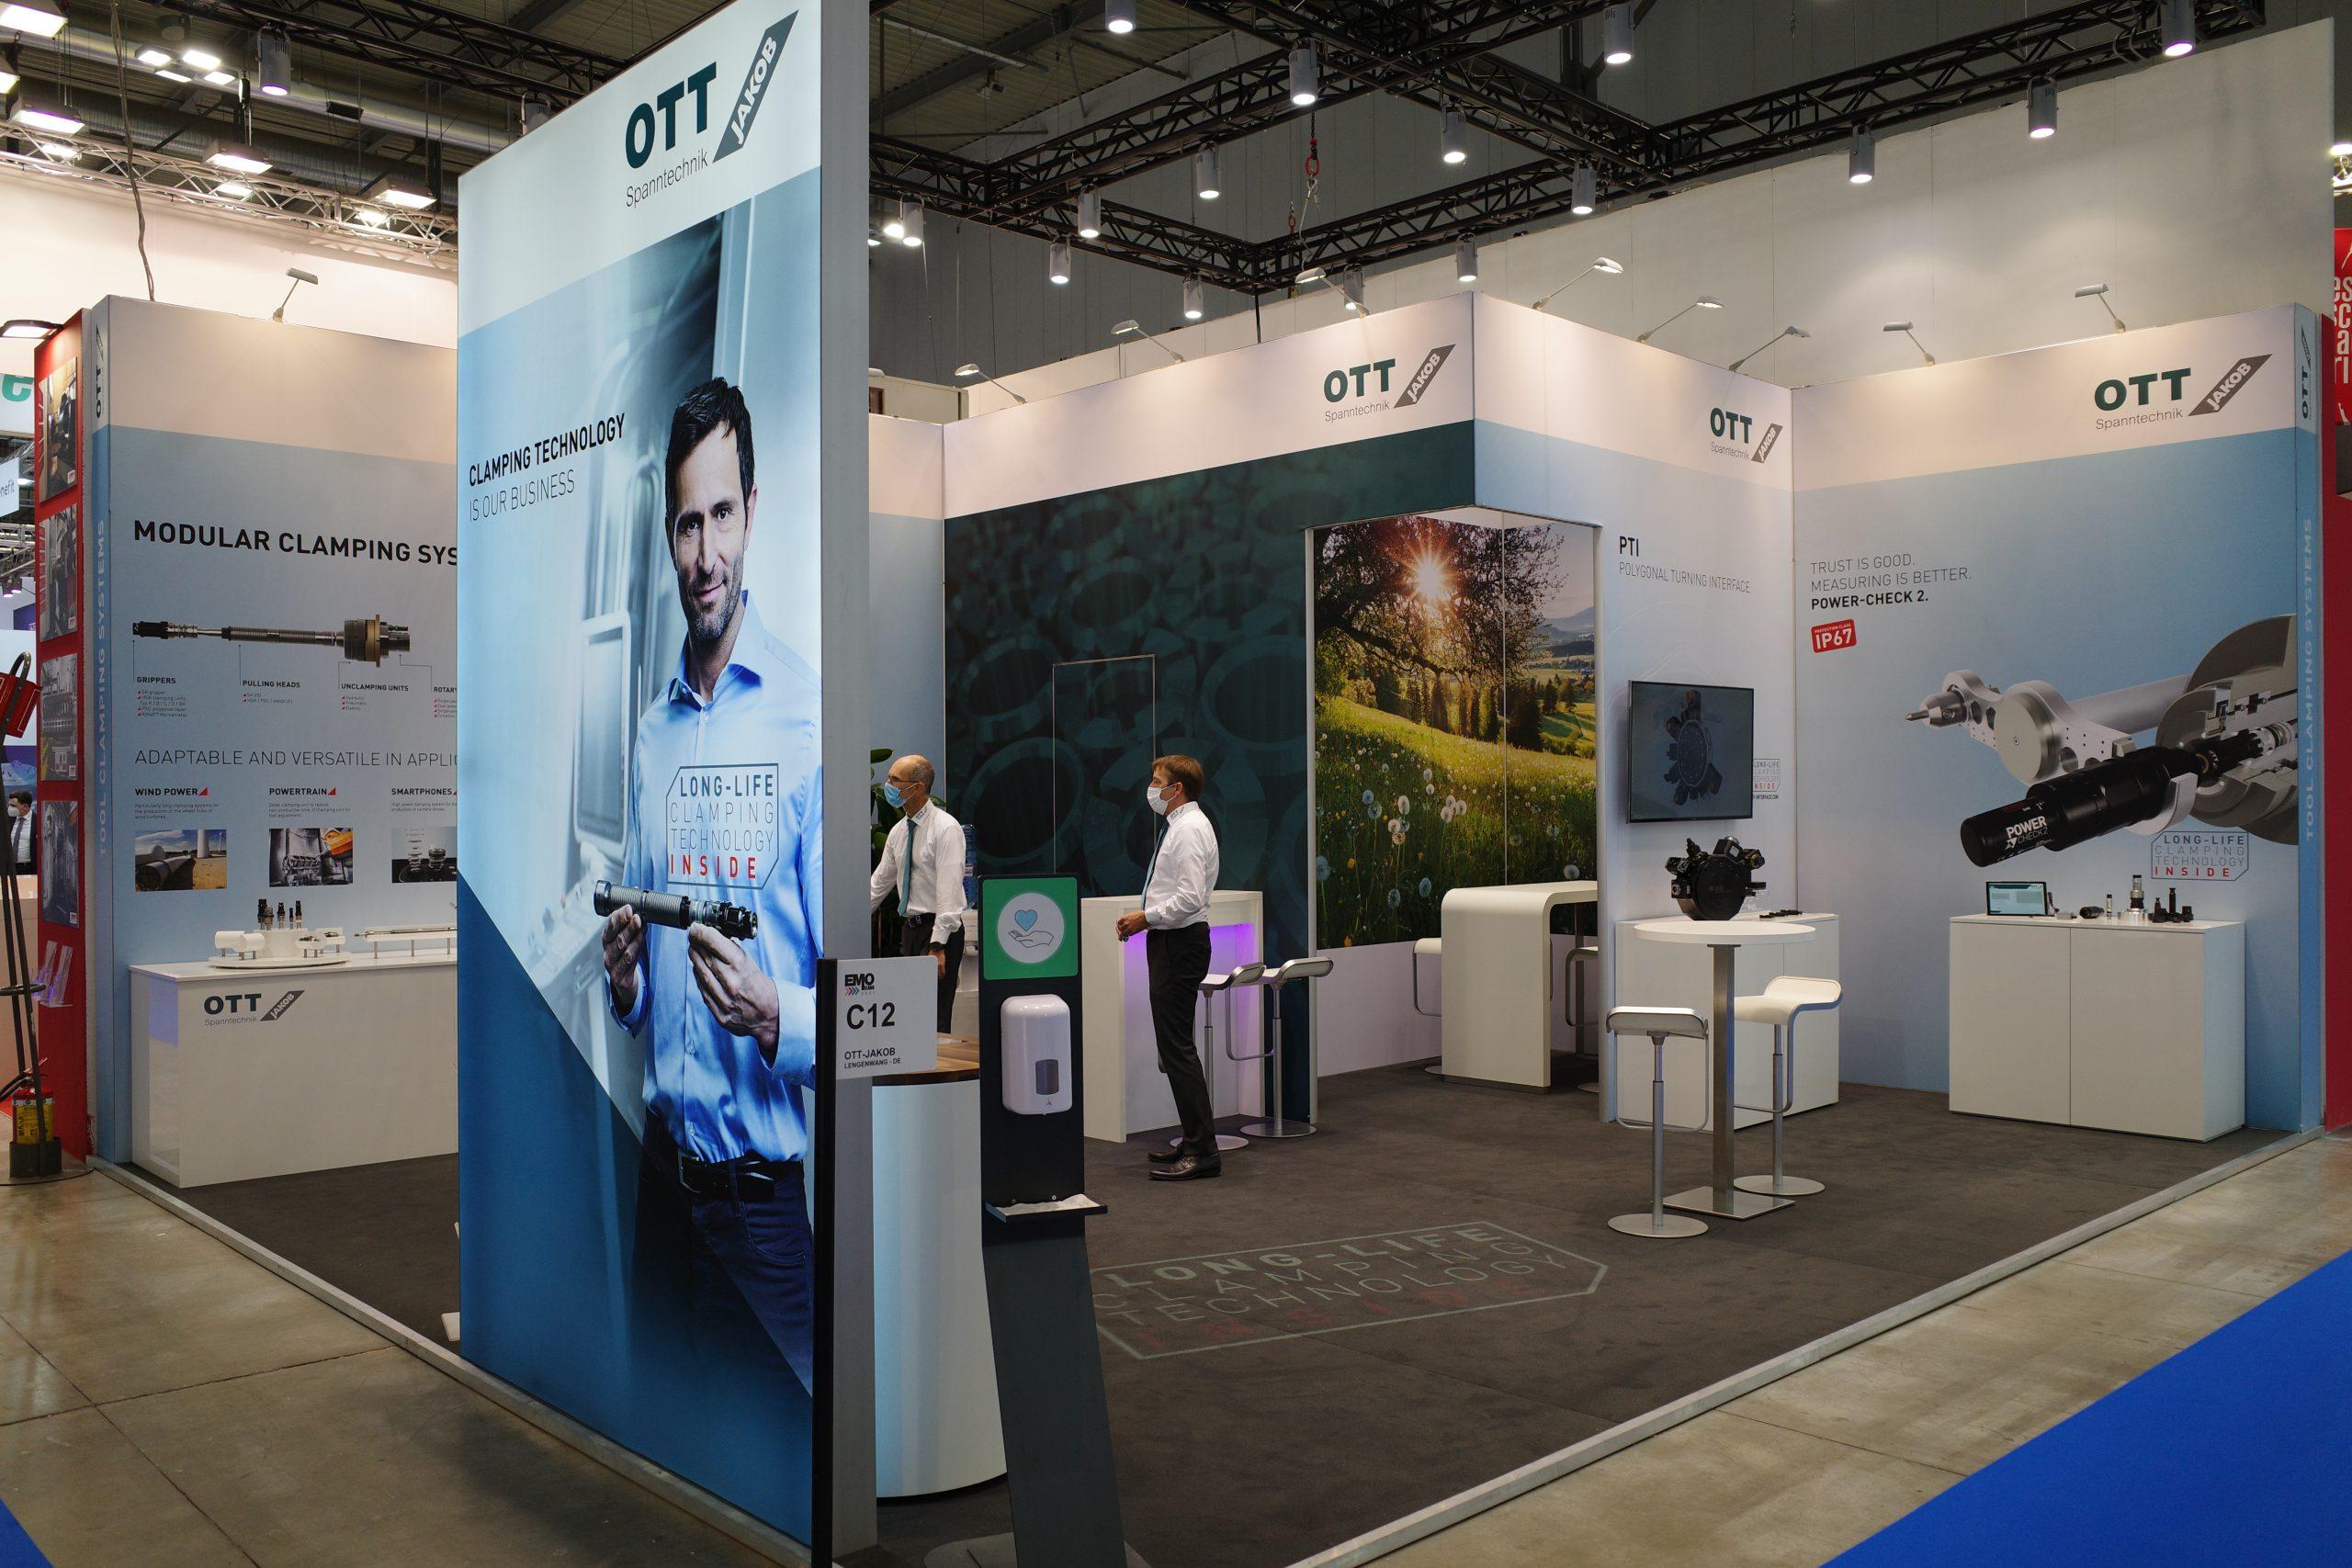 OTT-JAKOB - Unternehmen - Bild - EMO highlights 2021